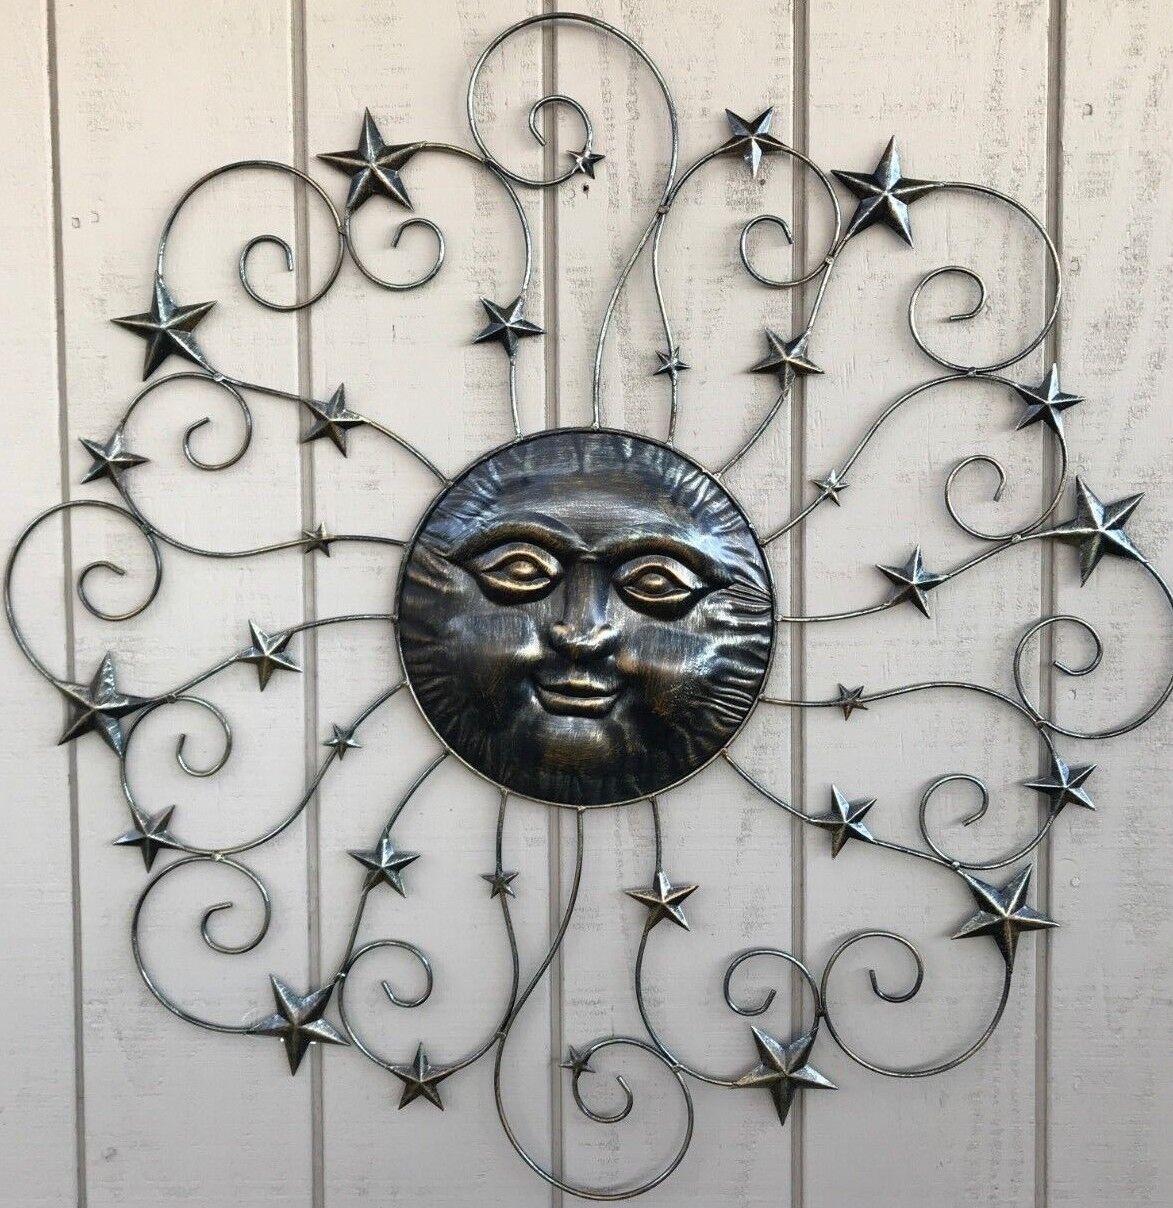 38 Sun And Stars Nautical Metal Wall Art Indoor Outdoor Contemporary Home Decor Ebay